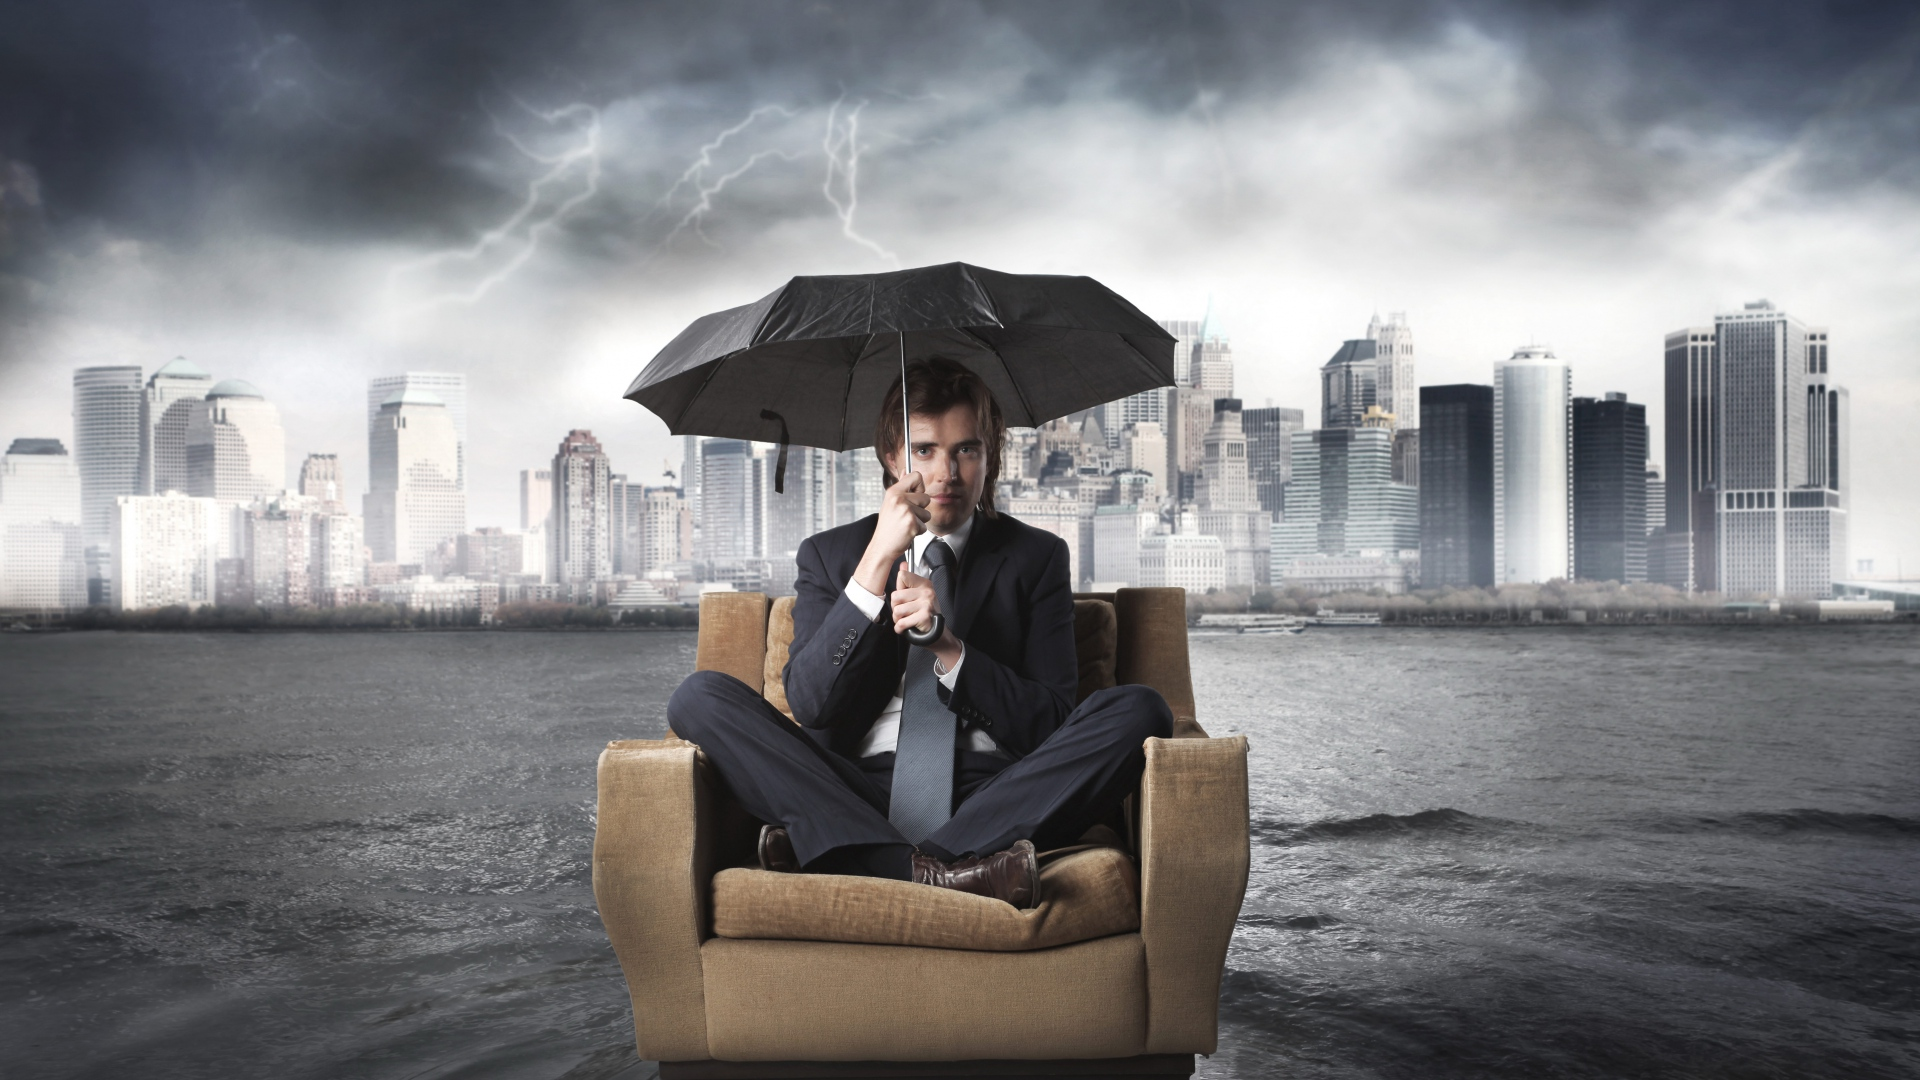 Download Wallpaper 1920x1080 Businessman Chair Flood Umbrella